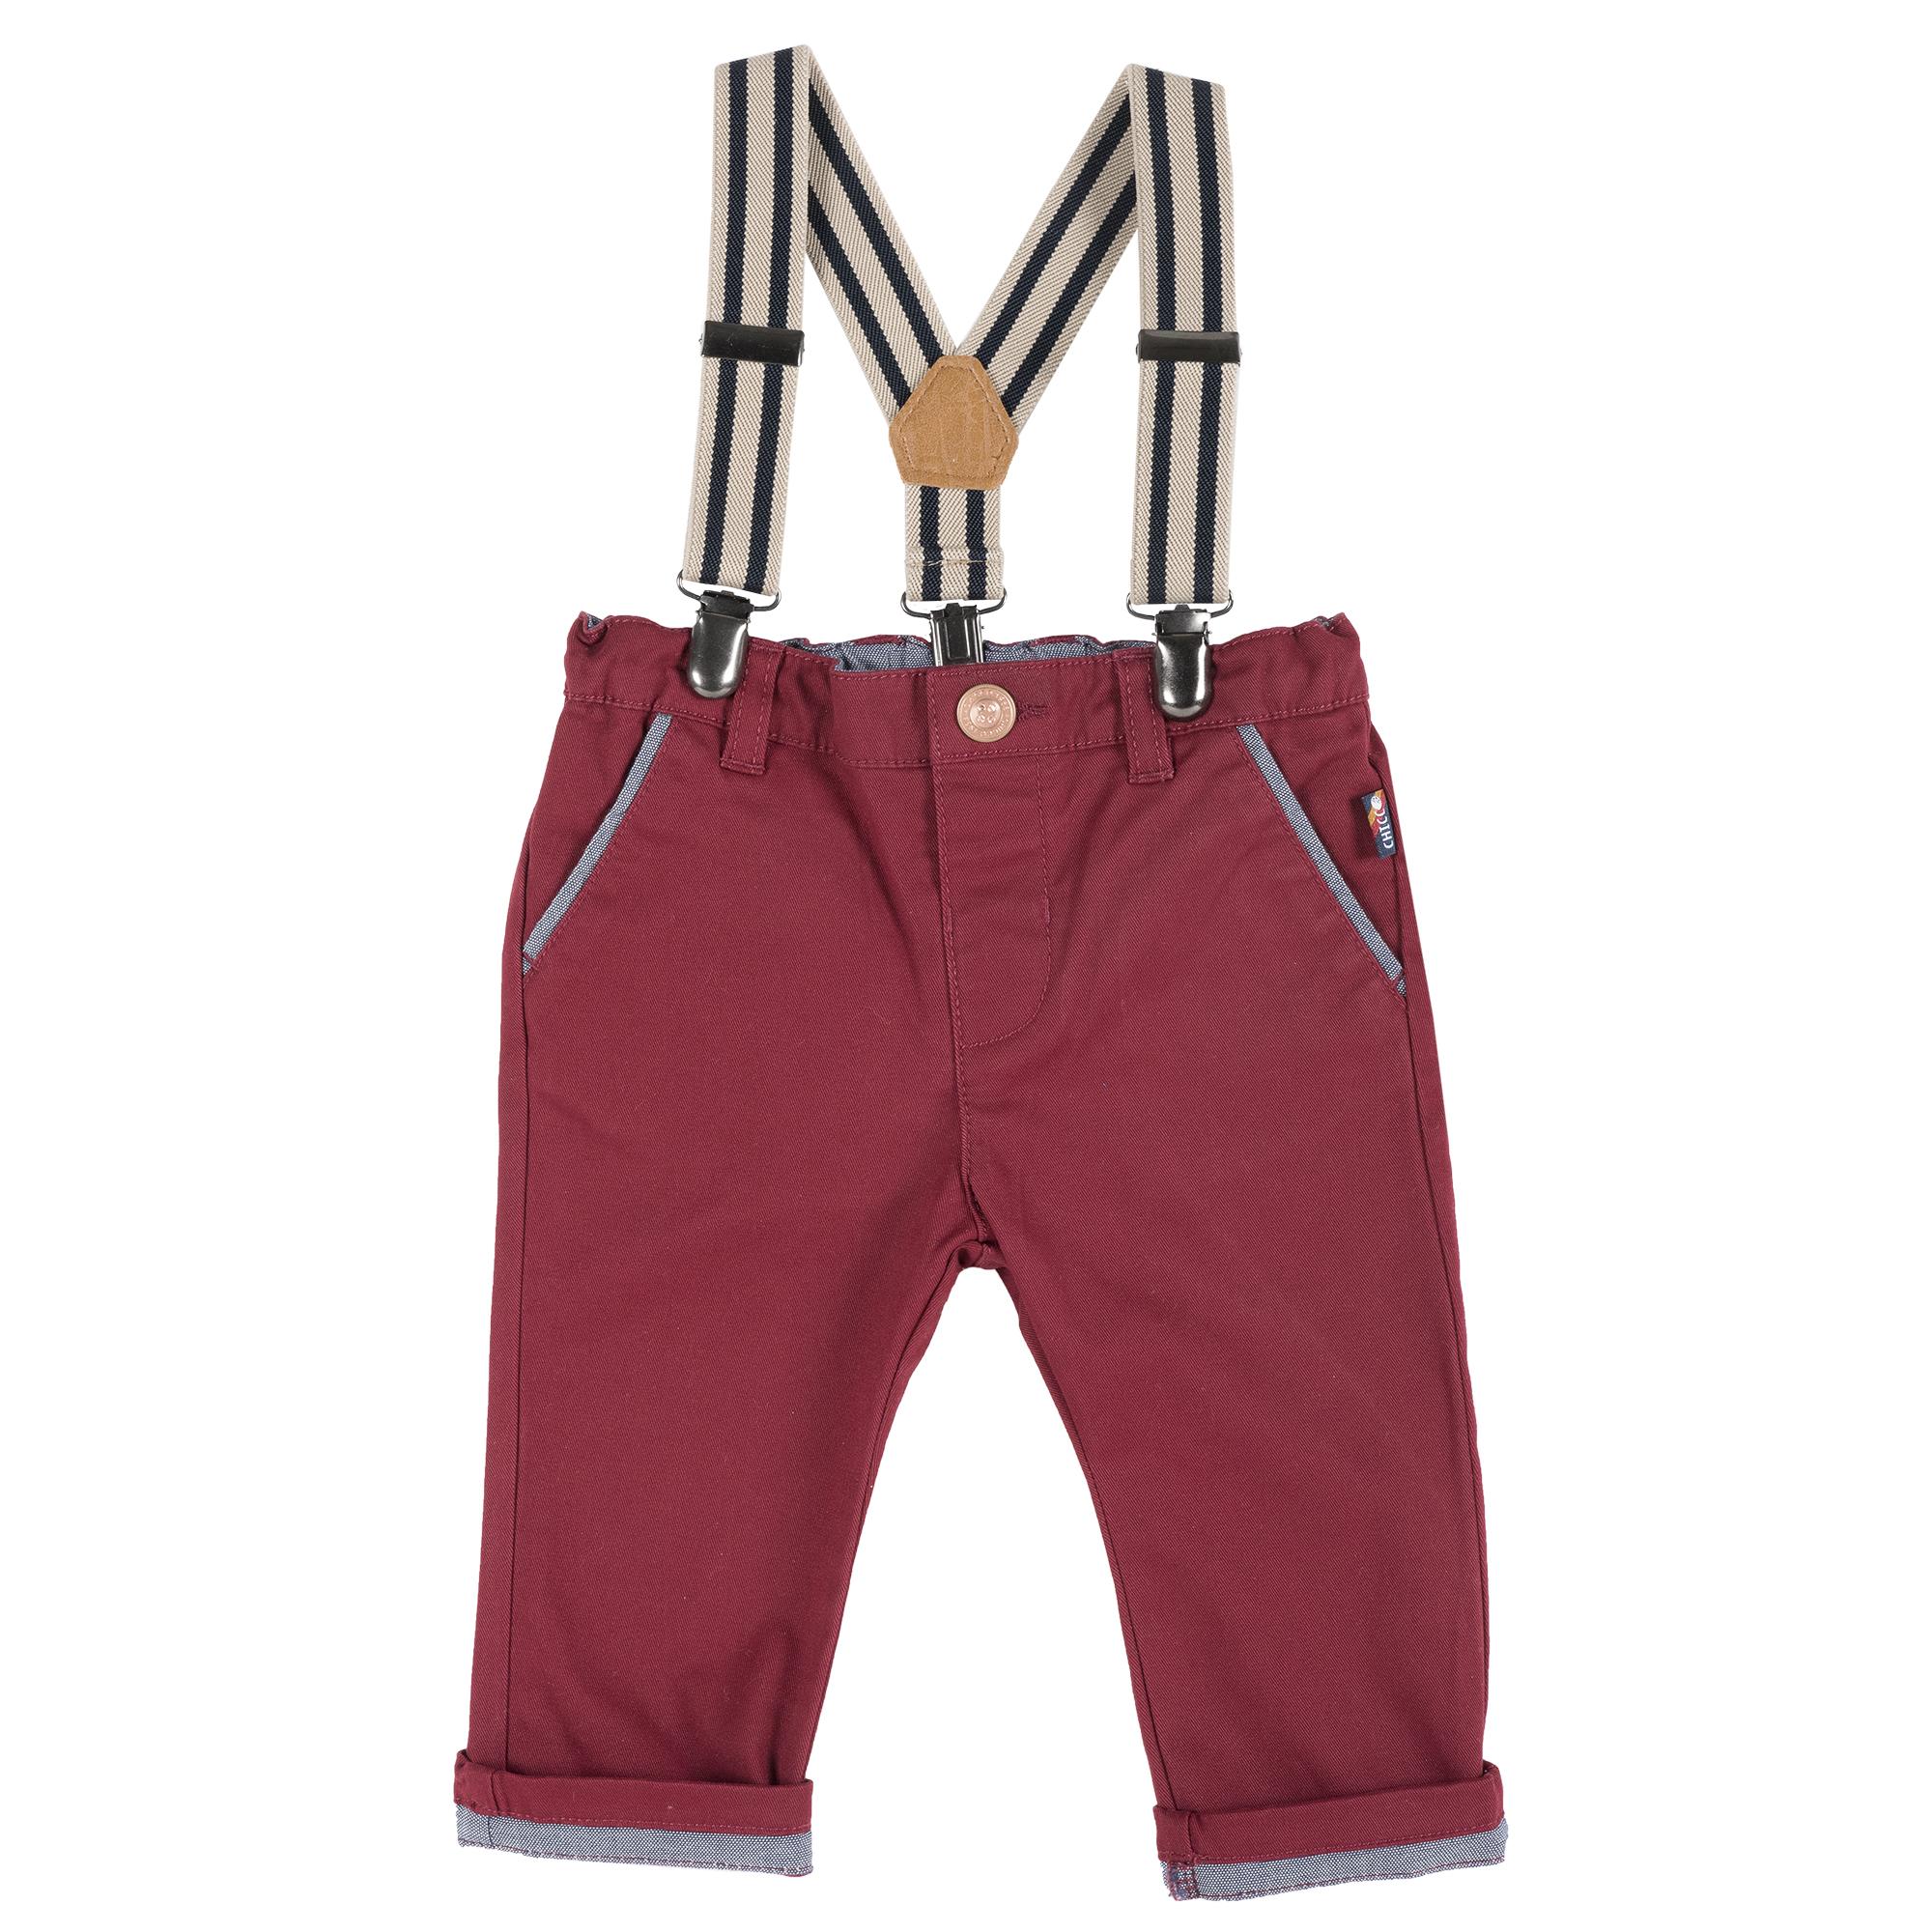 Pantalon copii Chicco, visiniu din categoria Pantaloni copii